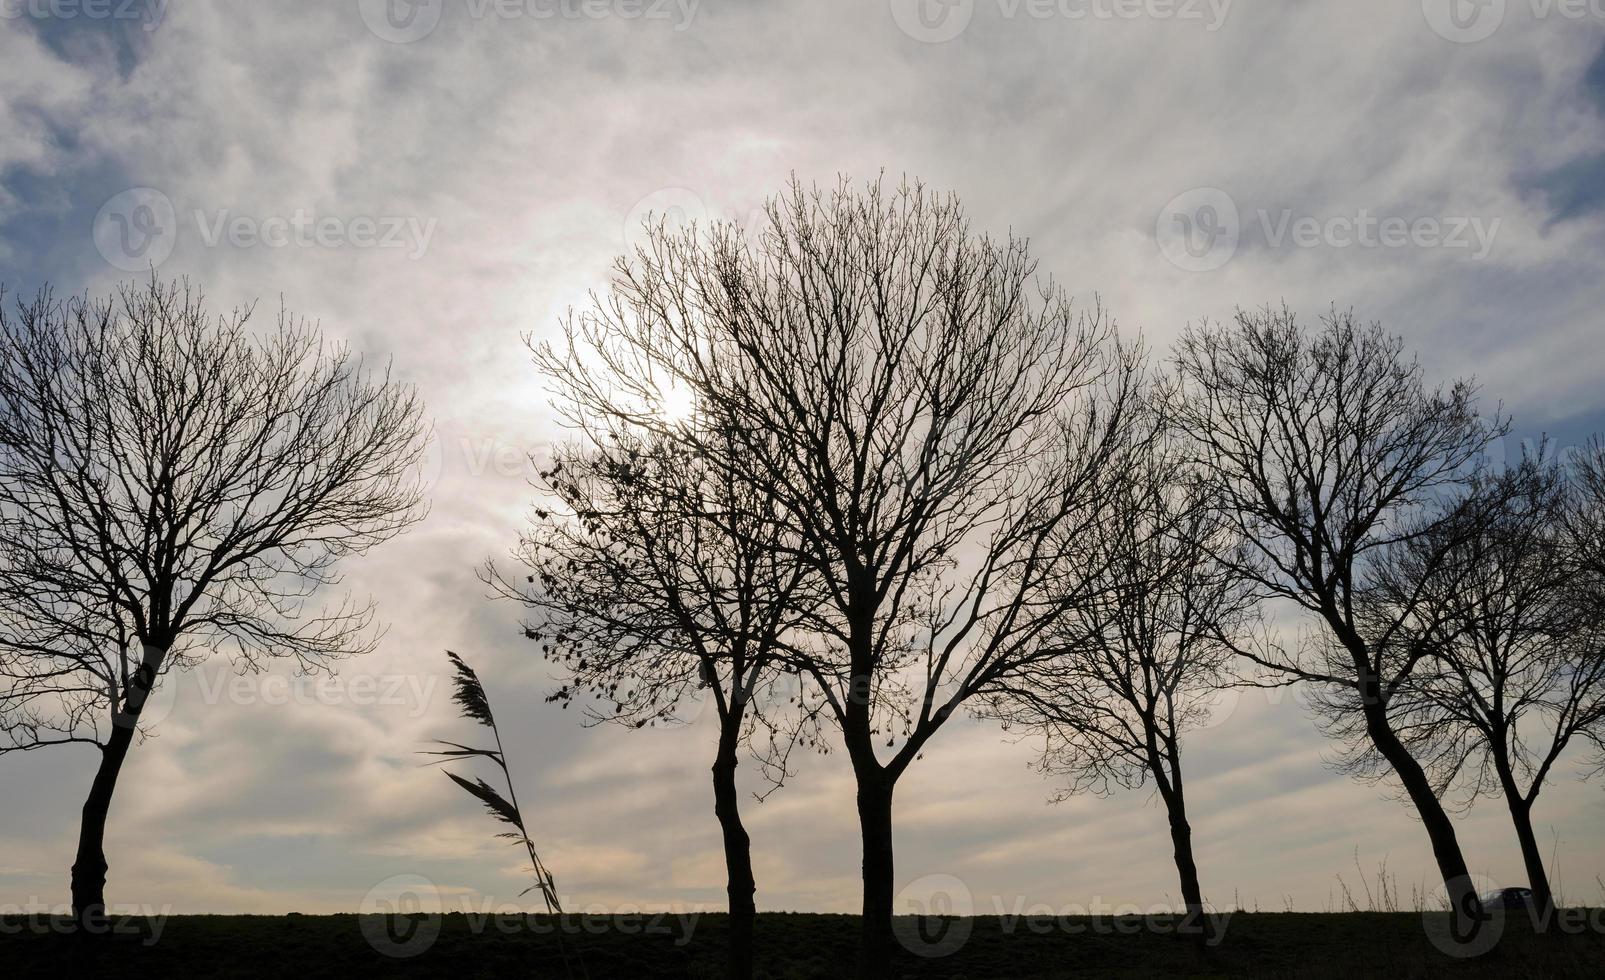 árvores na luz solar ao longo das terras agrícolas no inverno foto